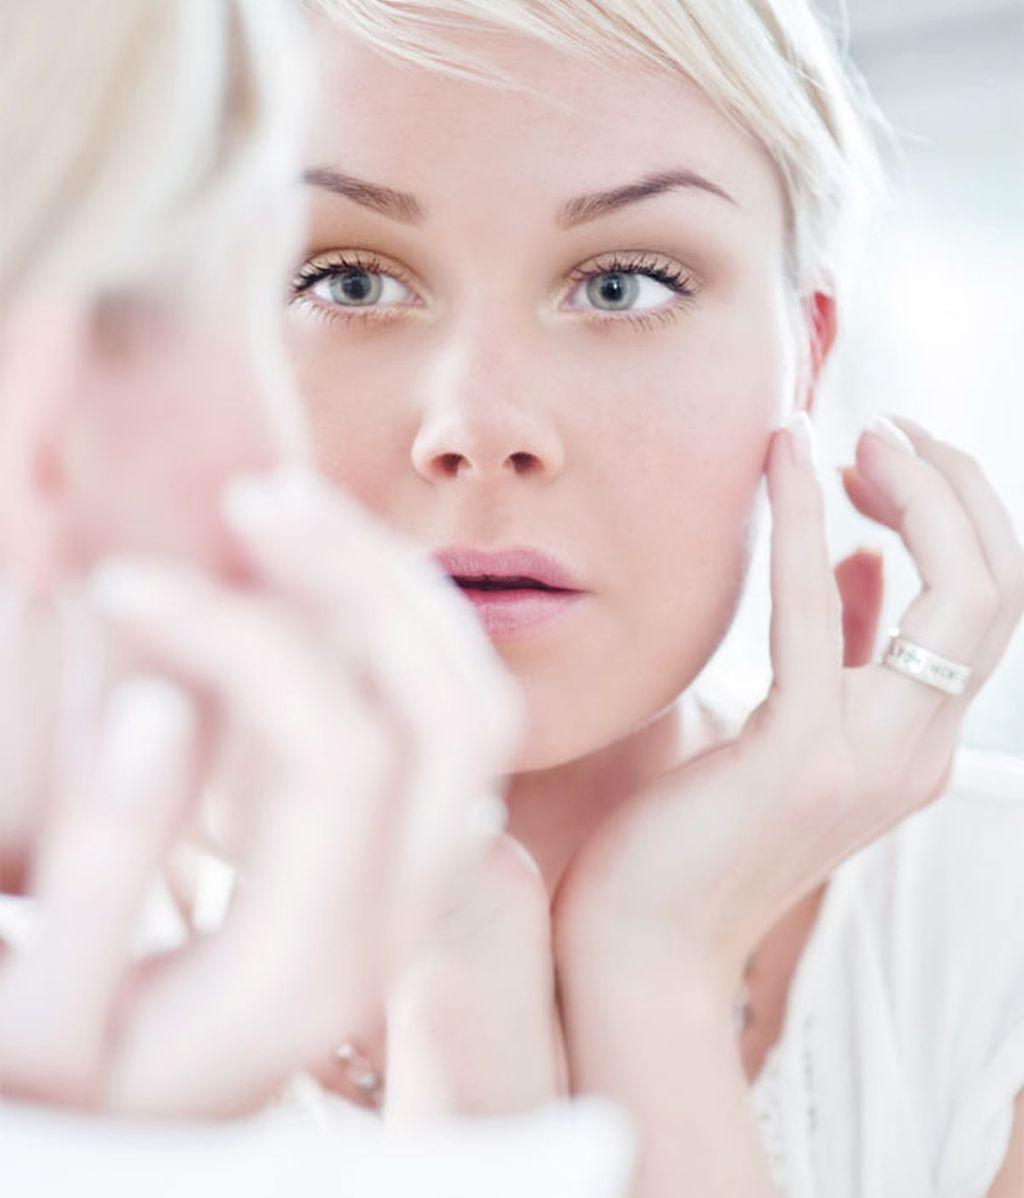 Manual de uso del sérum facial